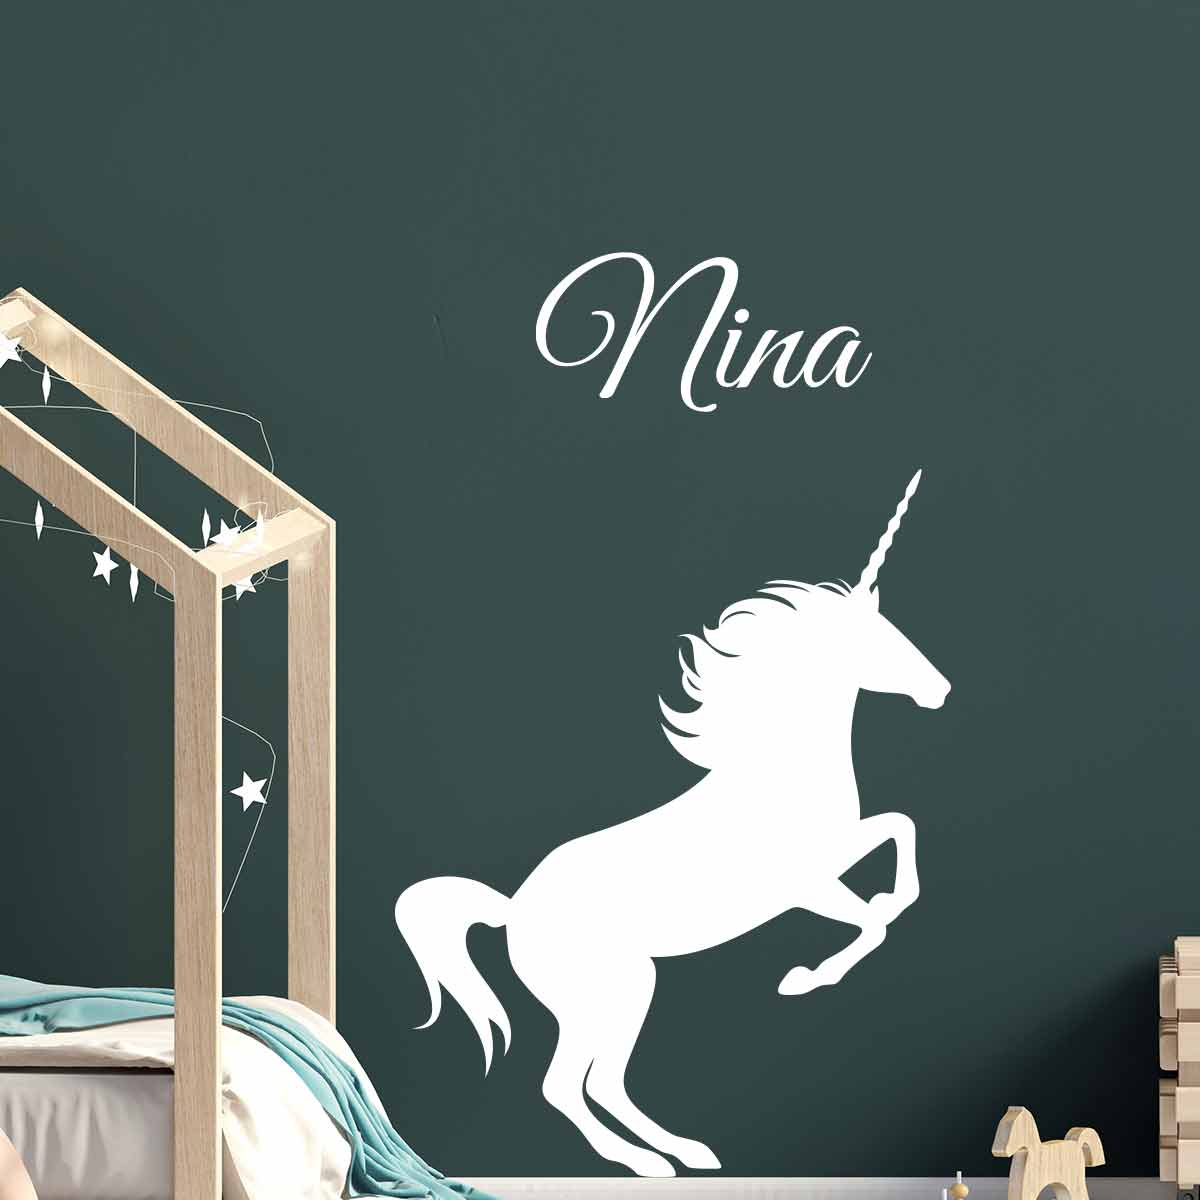 sticker pr nom personnalisable licorne texte. Black Bedroom Furniture Sets. Home Design Ideas